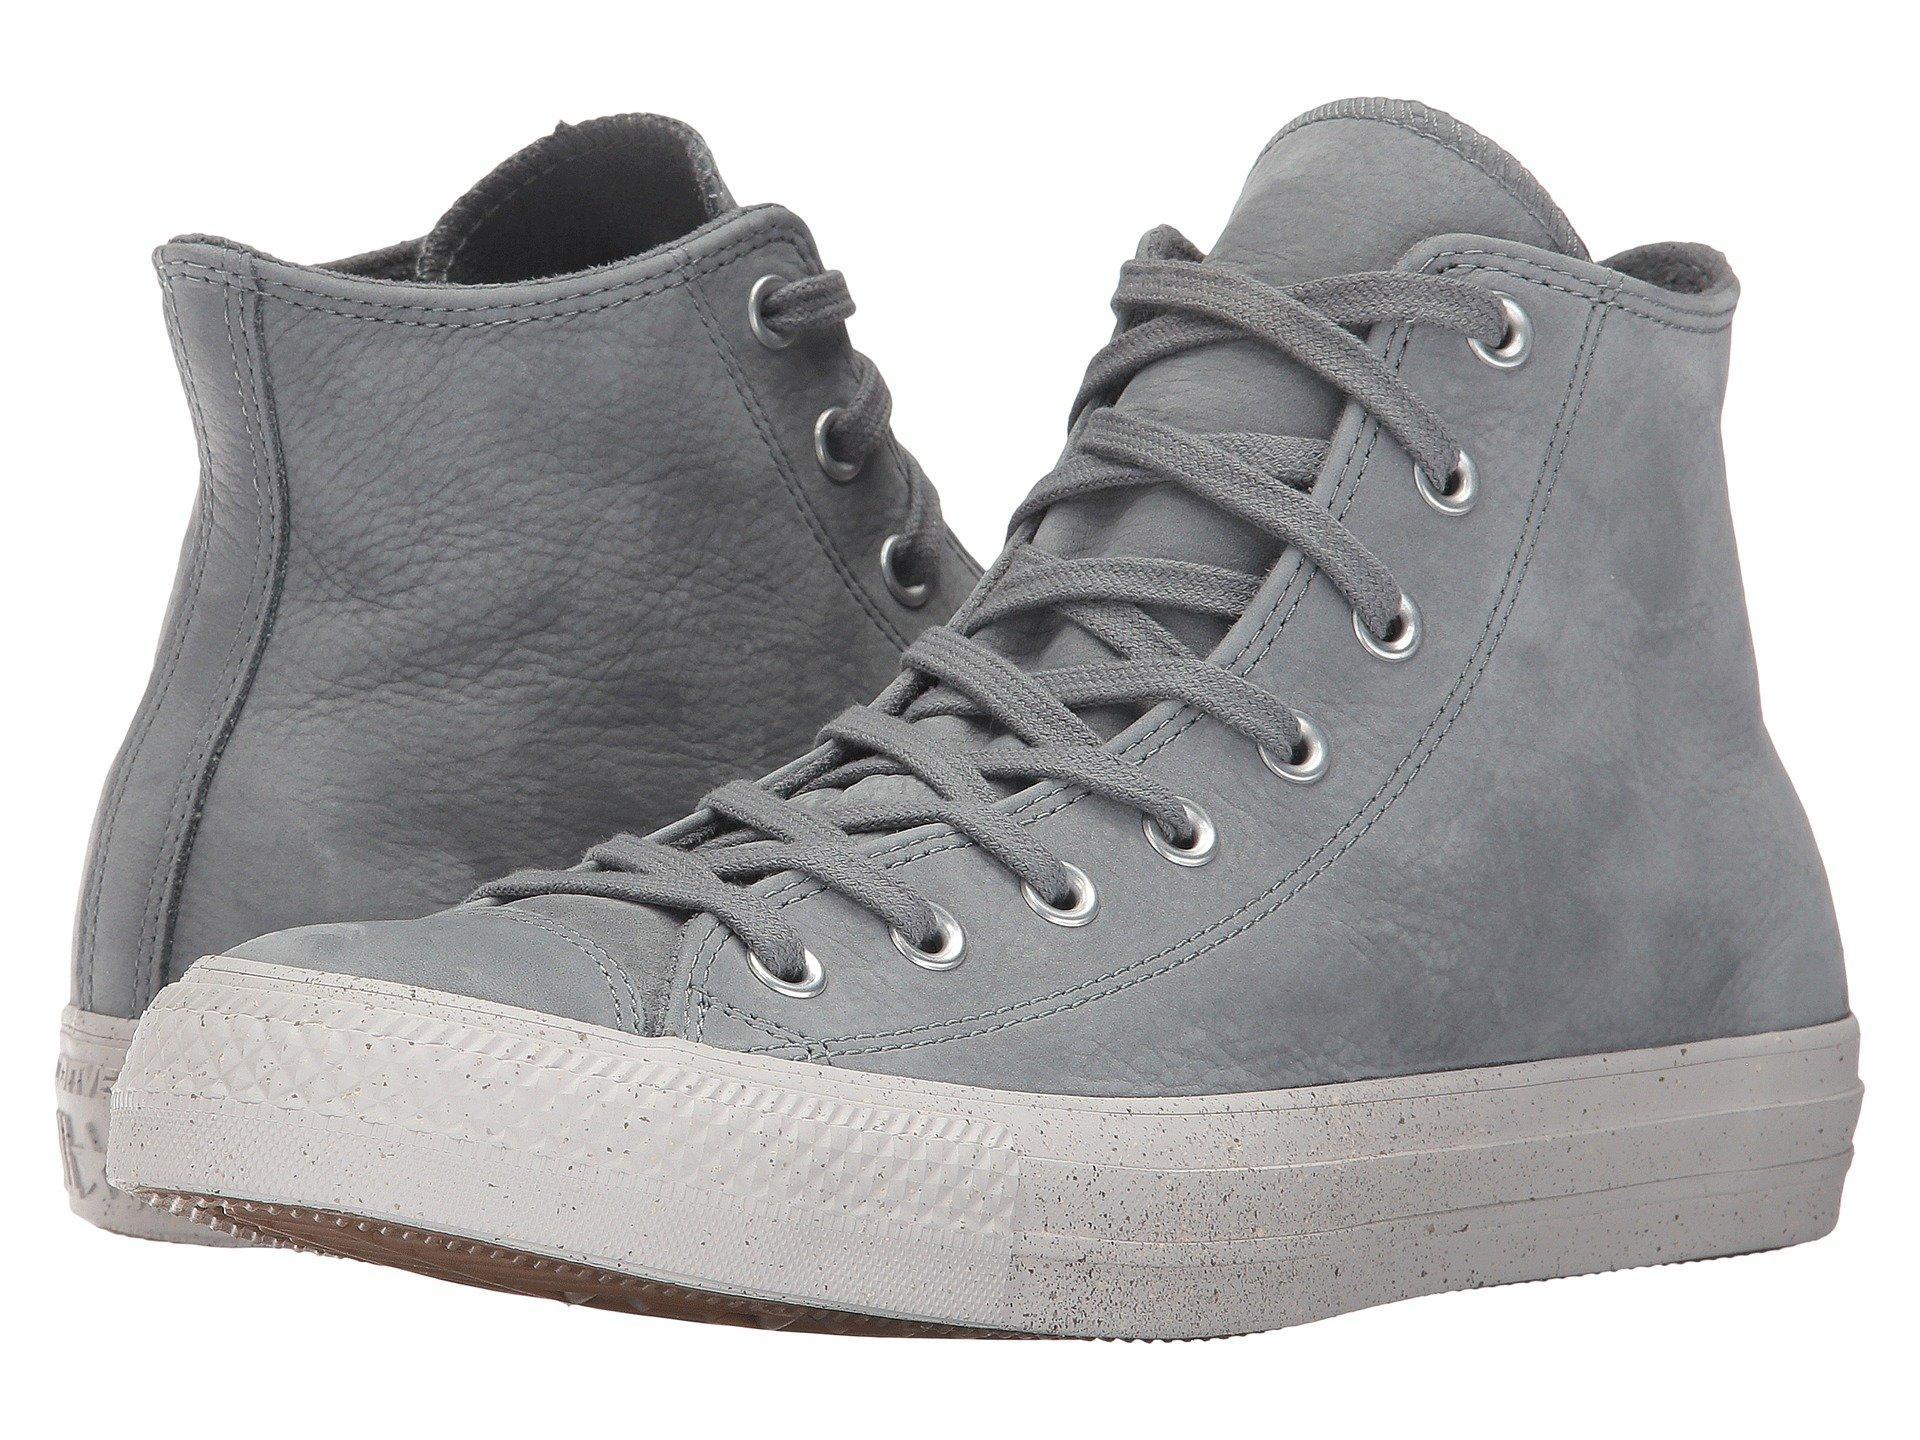 5e42e5f0b0408a Converse Chuck Taylor All Star Nubuck Hi In Cool Grey Malted Pale Putty